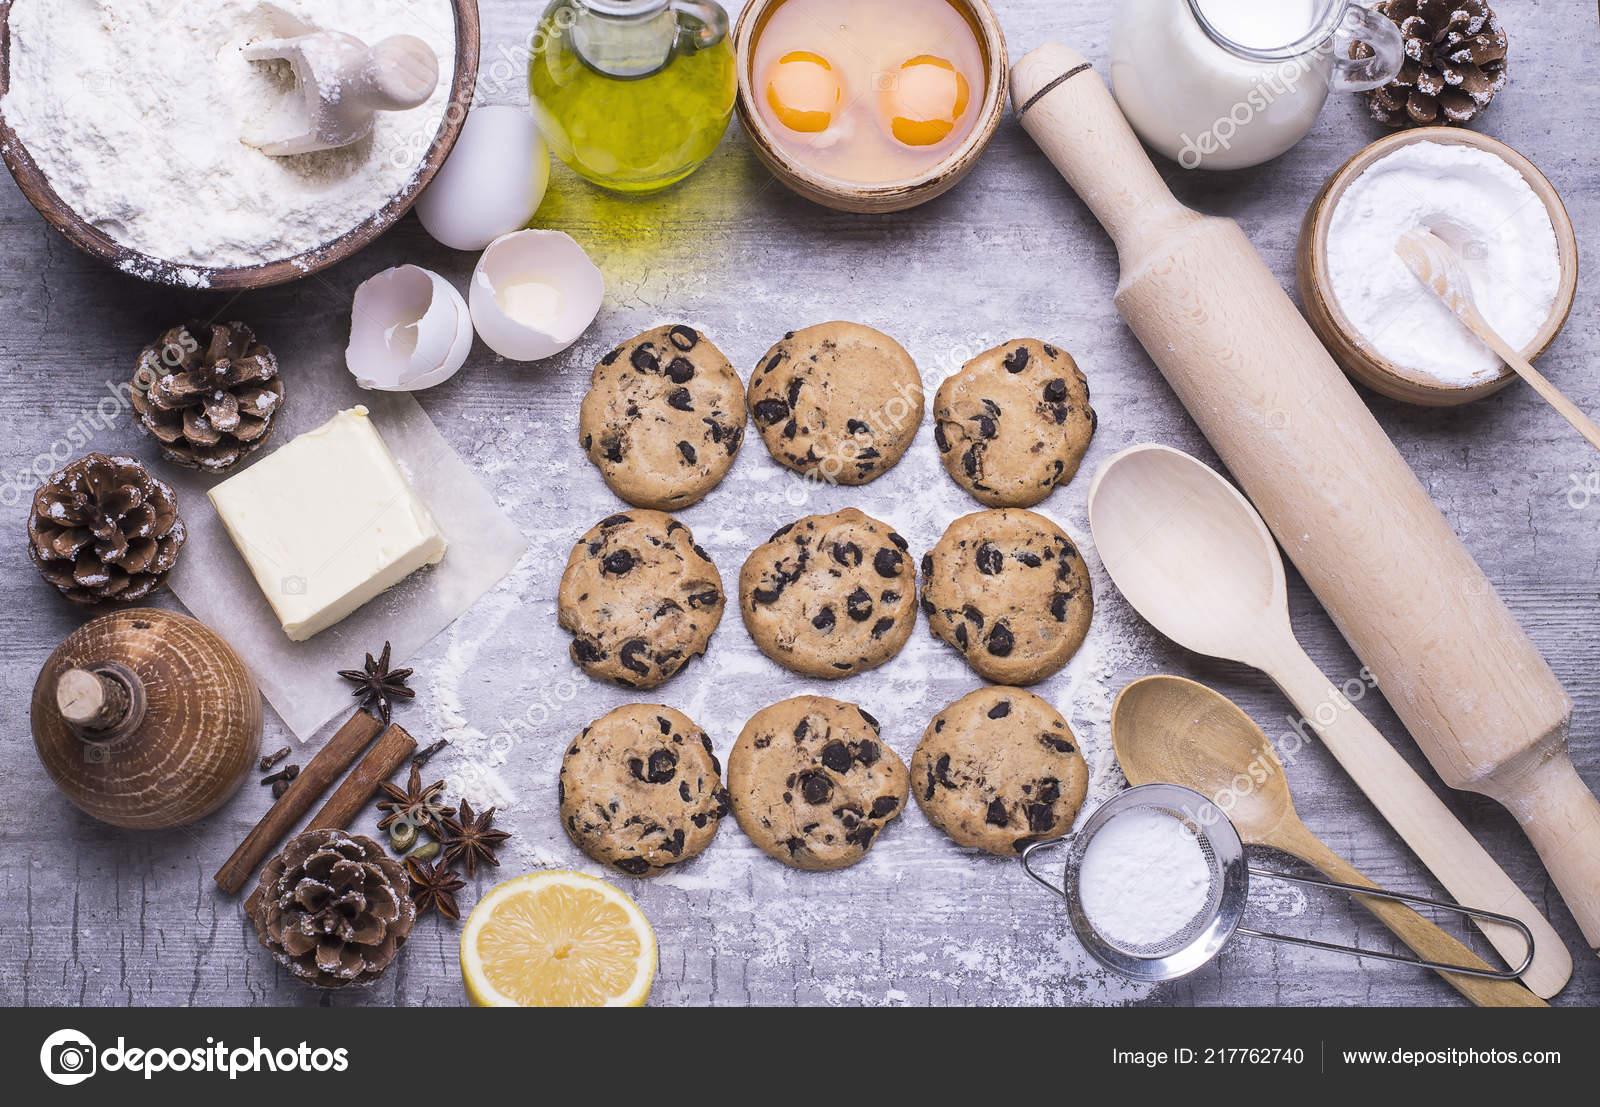 Natural Organic Ingredients Baking Homemade Christmas Biscuits